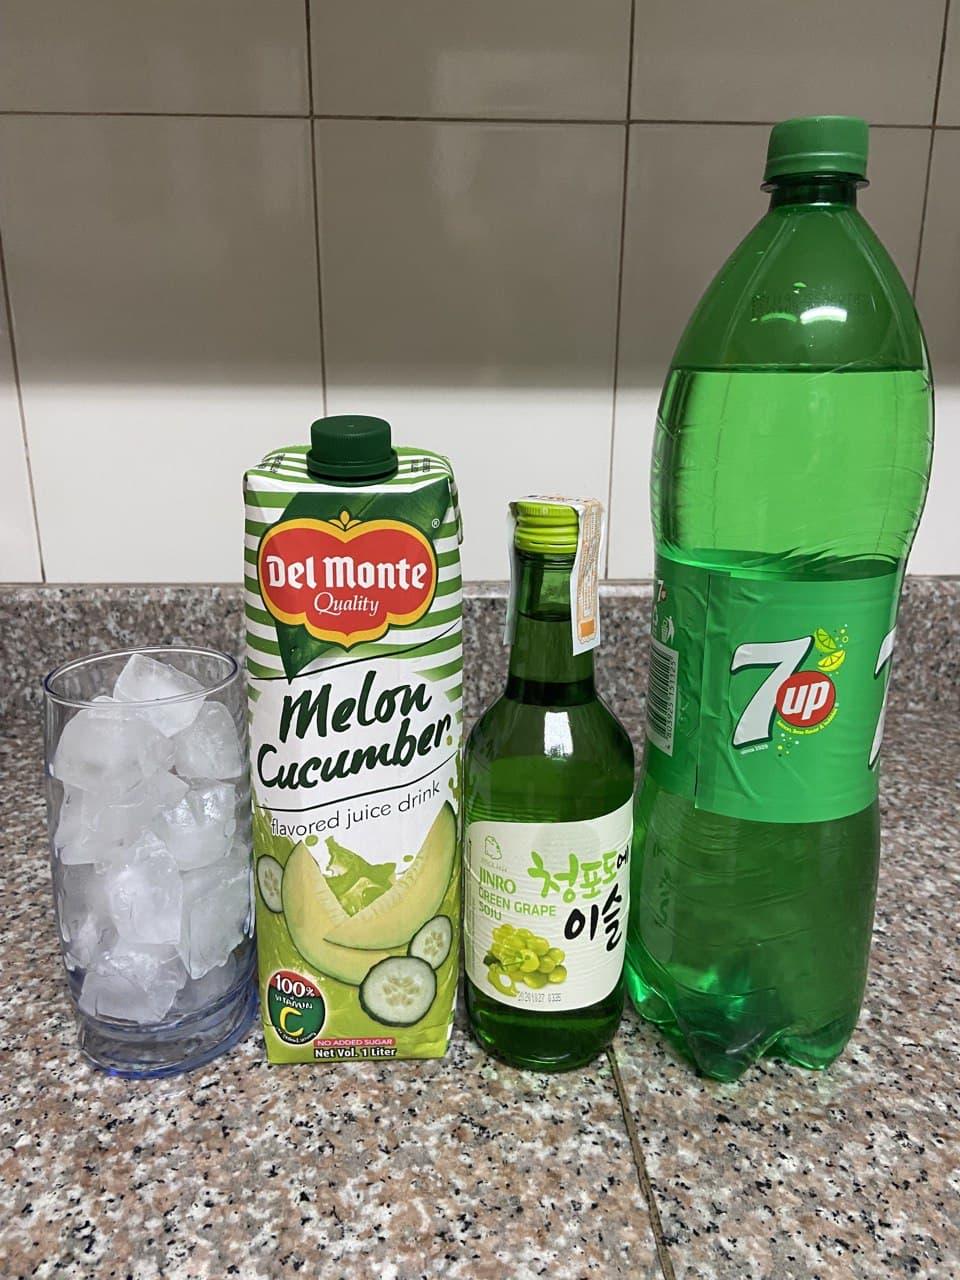 Soju cocktail recipe: ingredients (ice, melon cucumber juice, soju, and lemon soda)